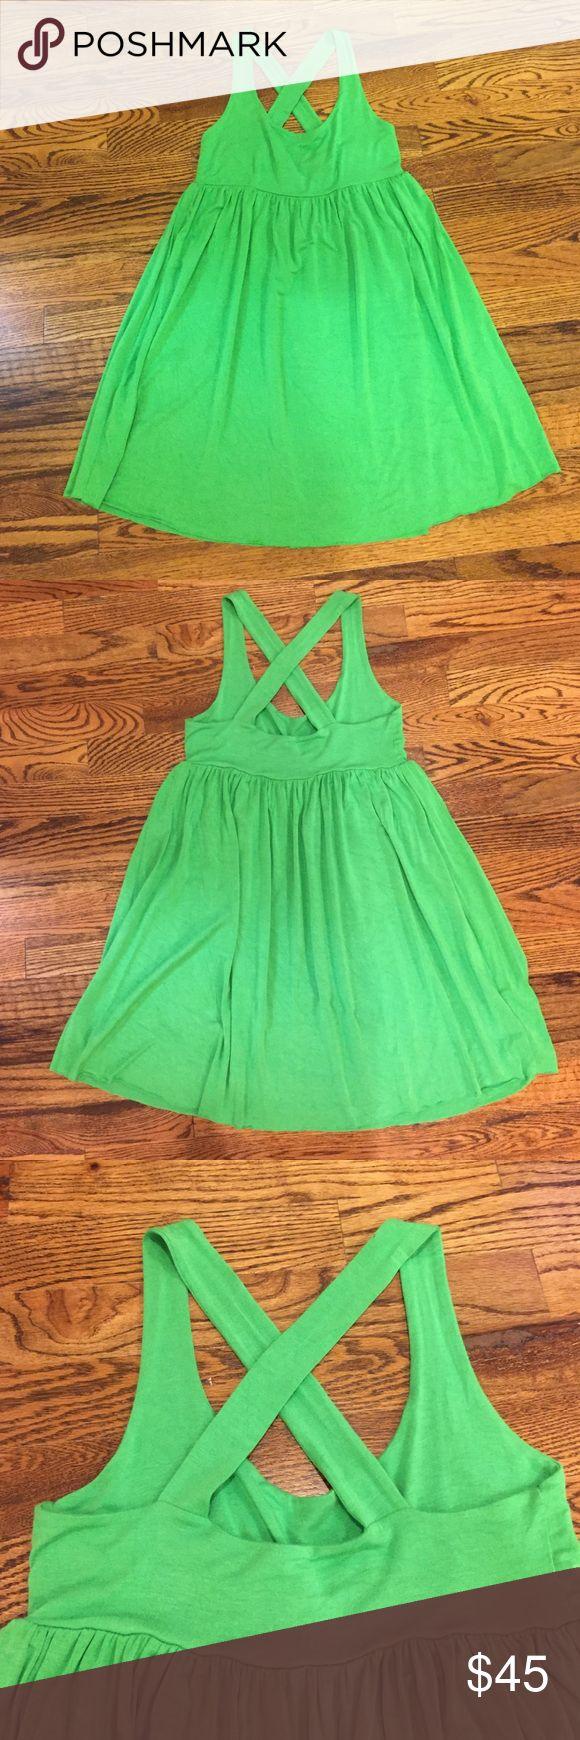 Rachel Pally Dress Rachel Pally Kelly green crisscross back dress. Fun and flirty dress! Runs big. 92% Modal, 8% Spandex. Rachel Pally Dresses